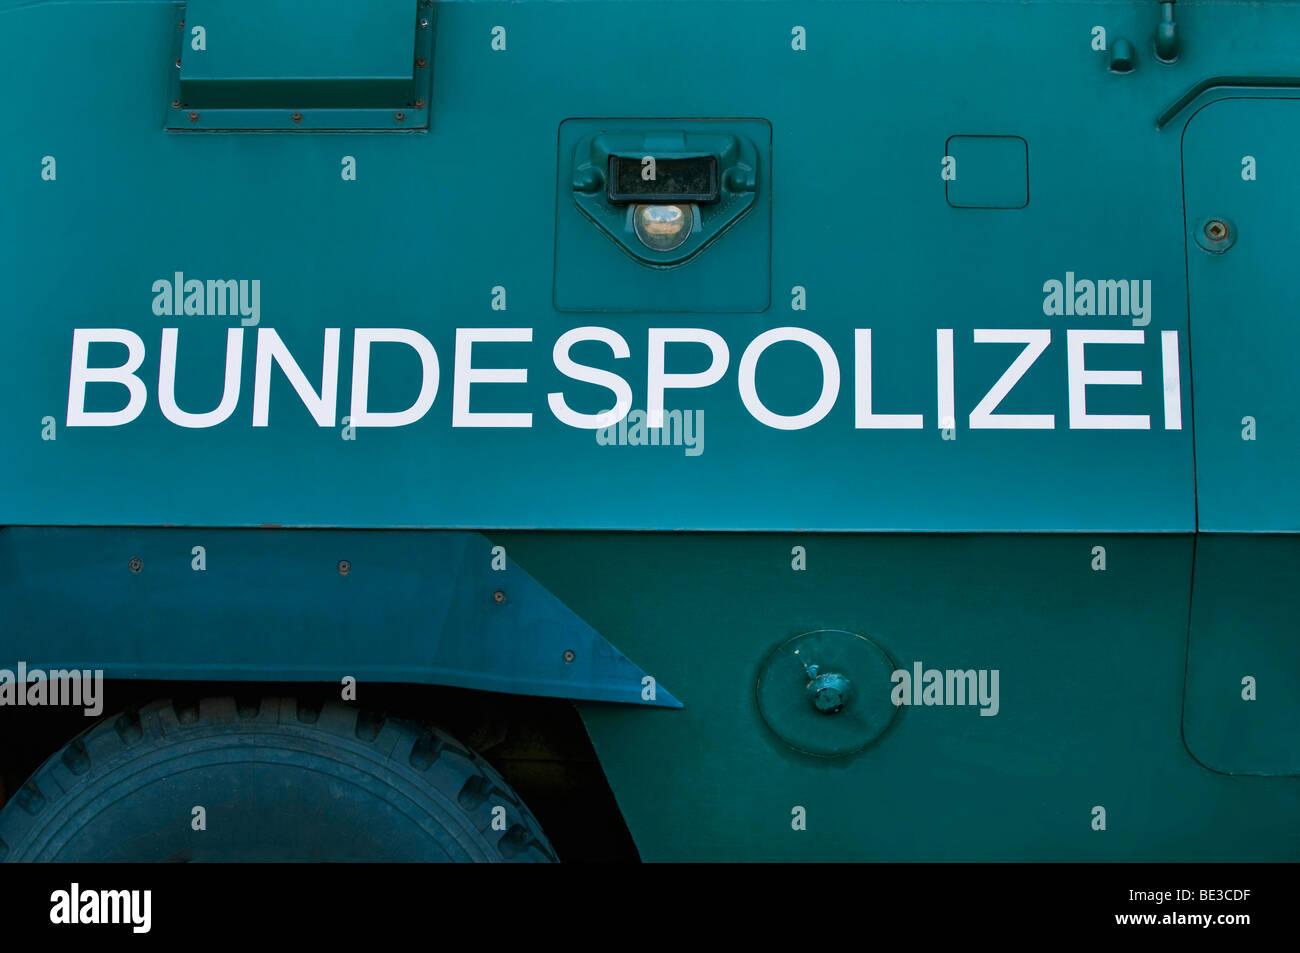 'Bundespolizei', federal police, written on armour-clad vehicle - Stock Image